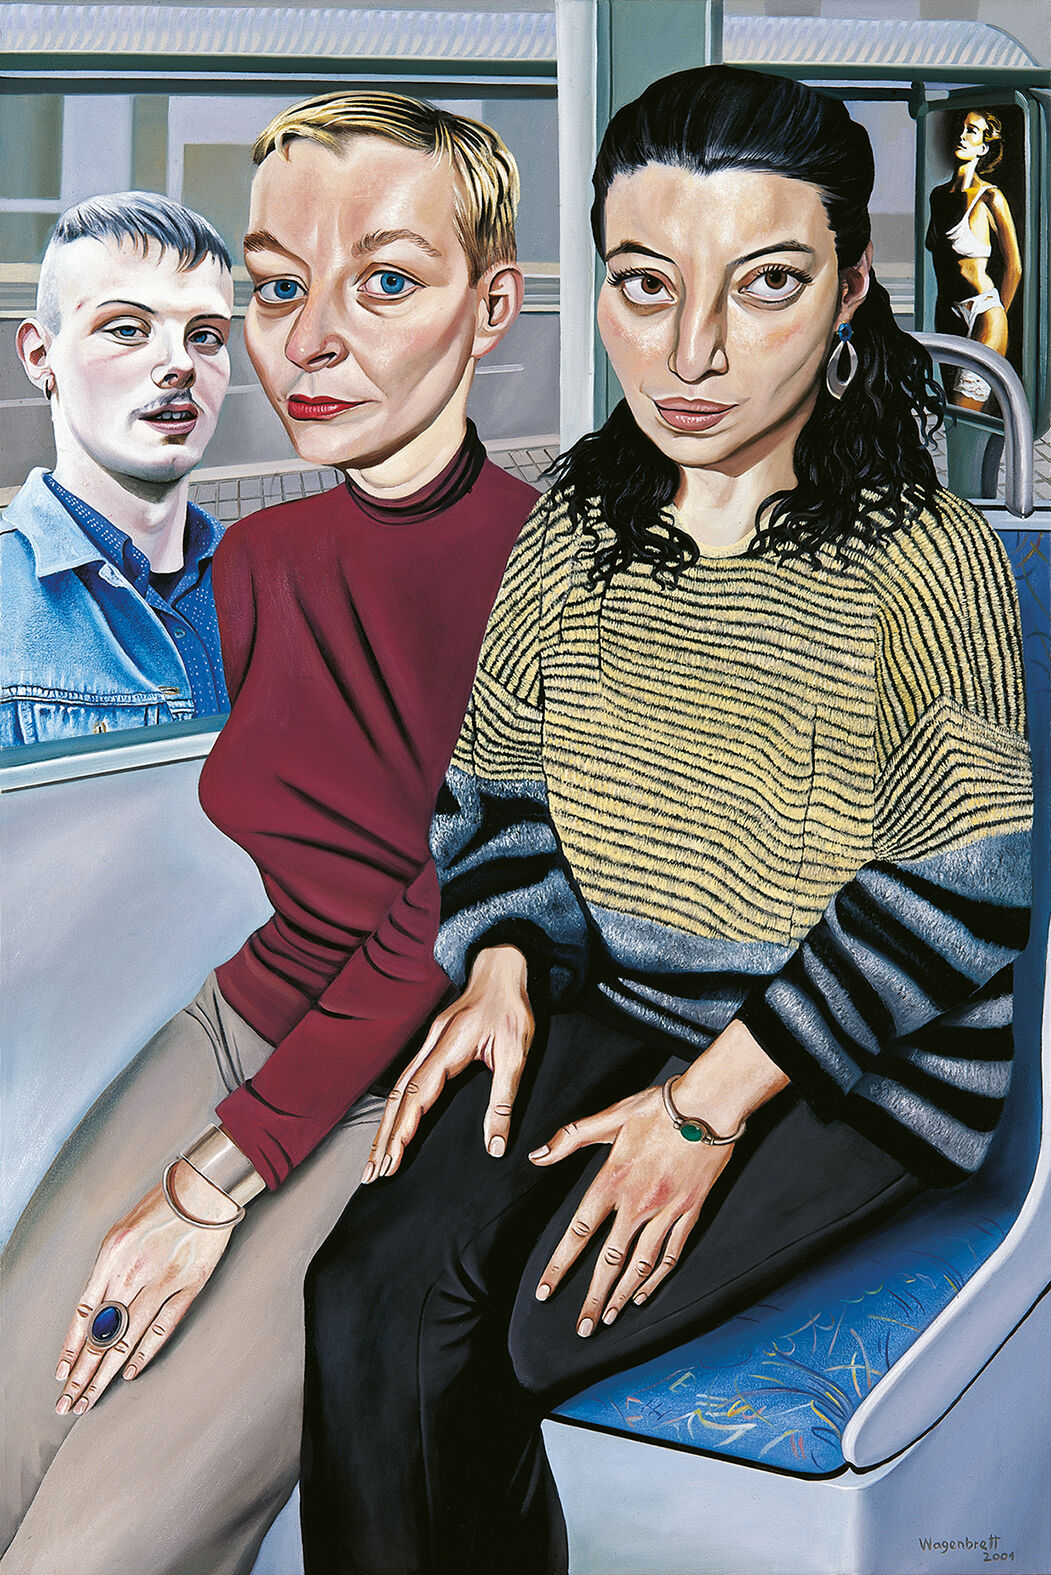 Norbert Wagenbrett, In der Strassenbahn (In the Tram), 2001. © VG Bild-Kunst Bonn 2020. Courtesy of the artist.